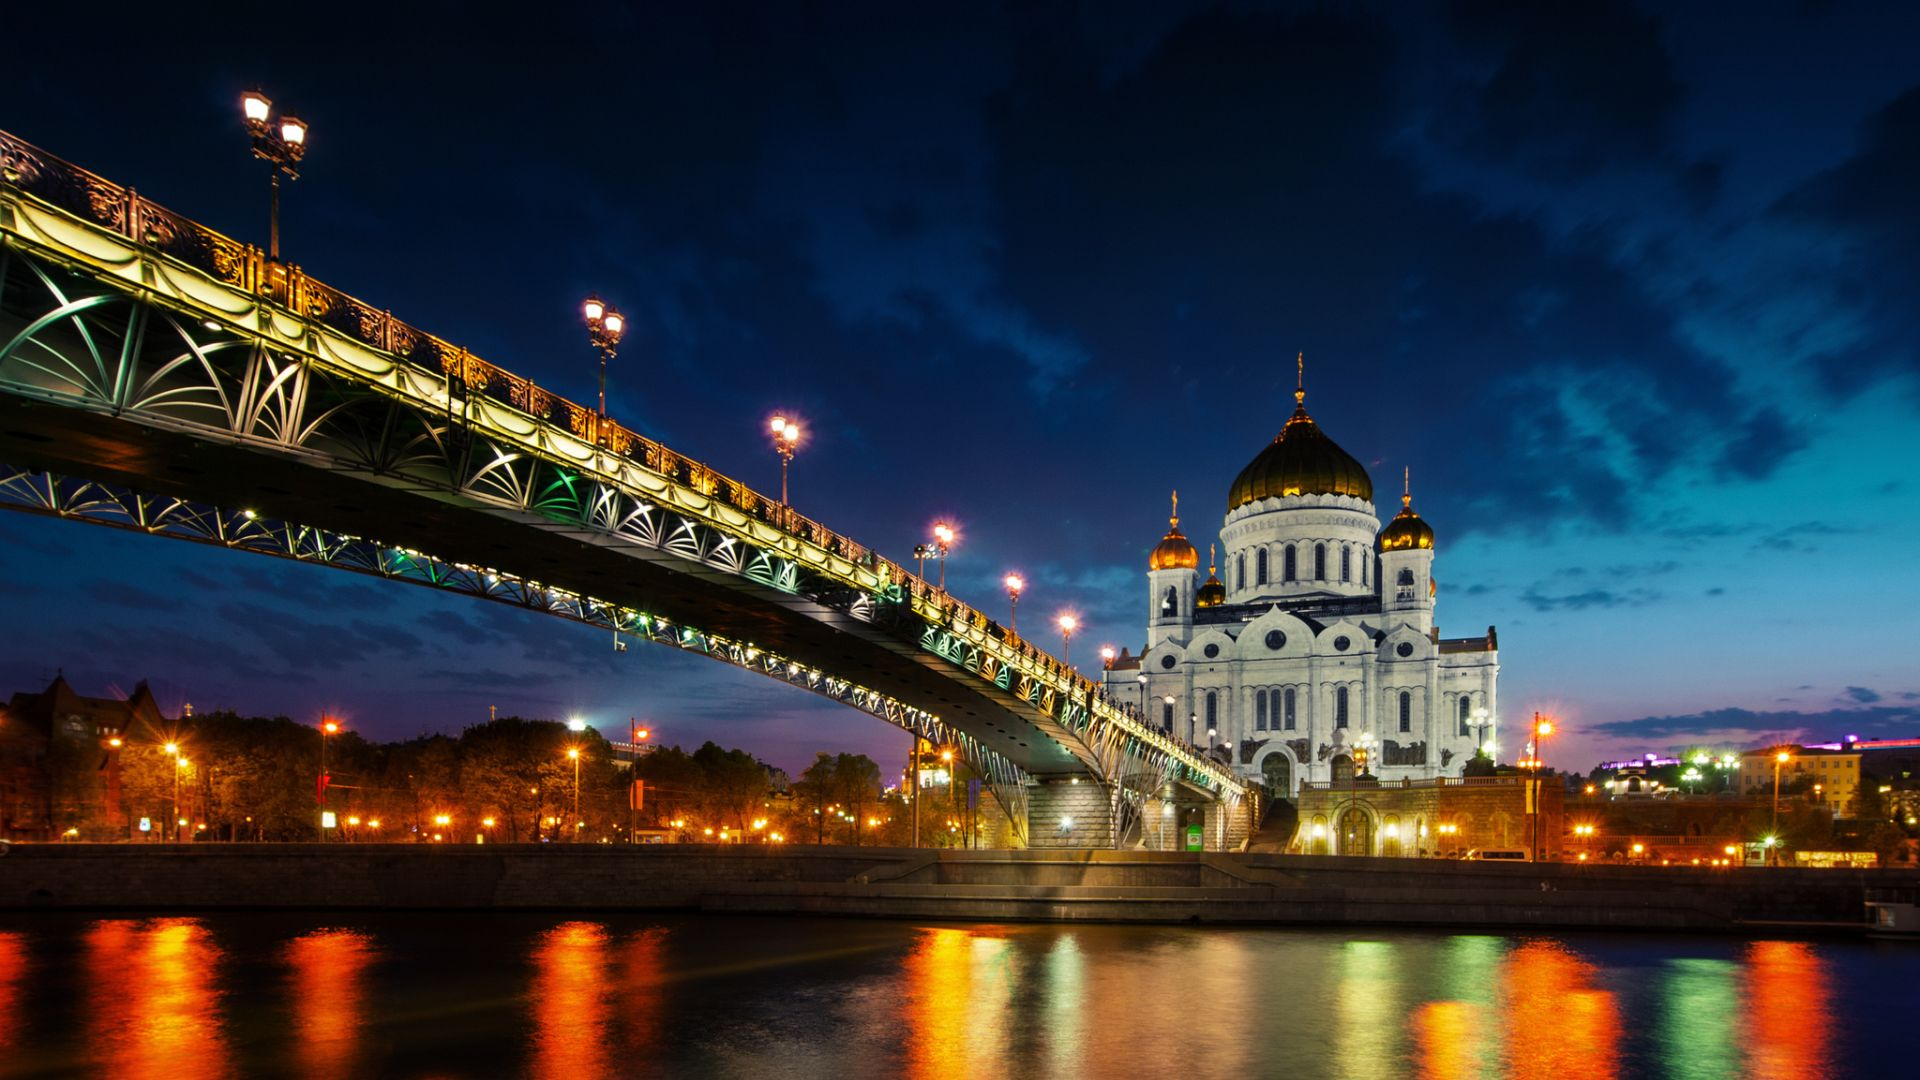 Moscou Russie Fond Ecran Hd Fond D Ecran Hd